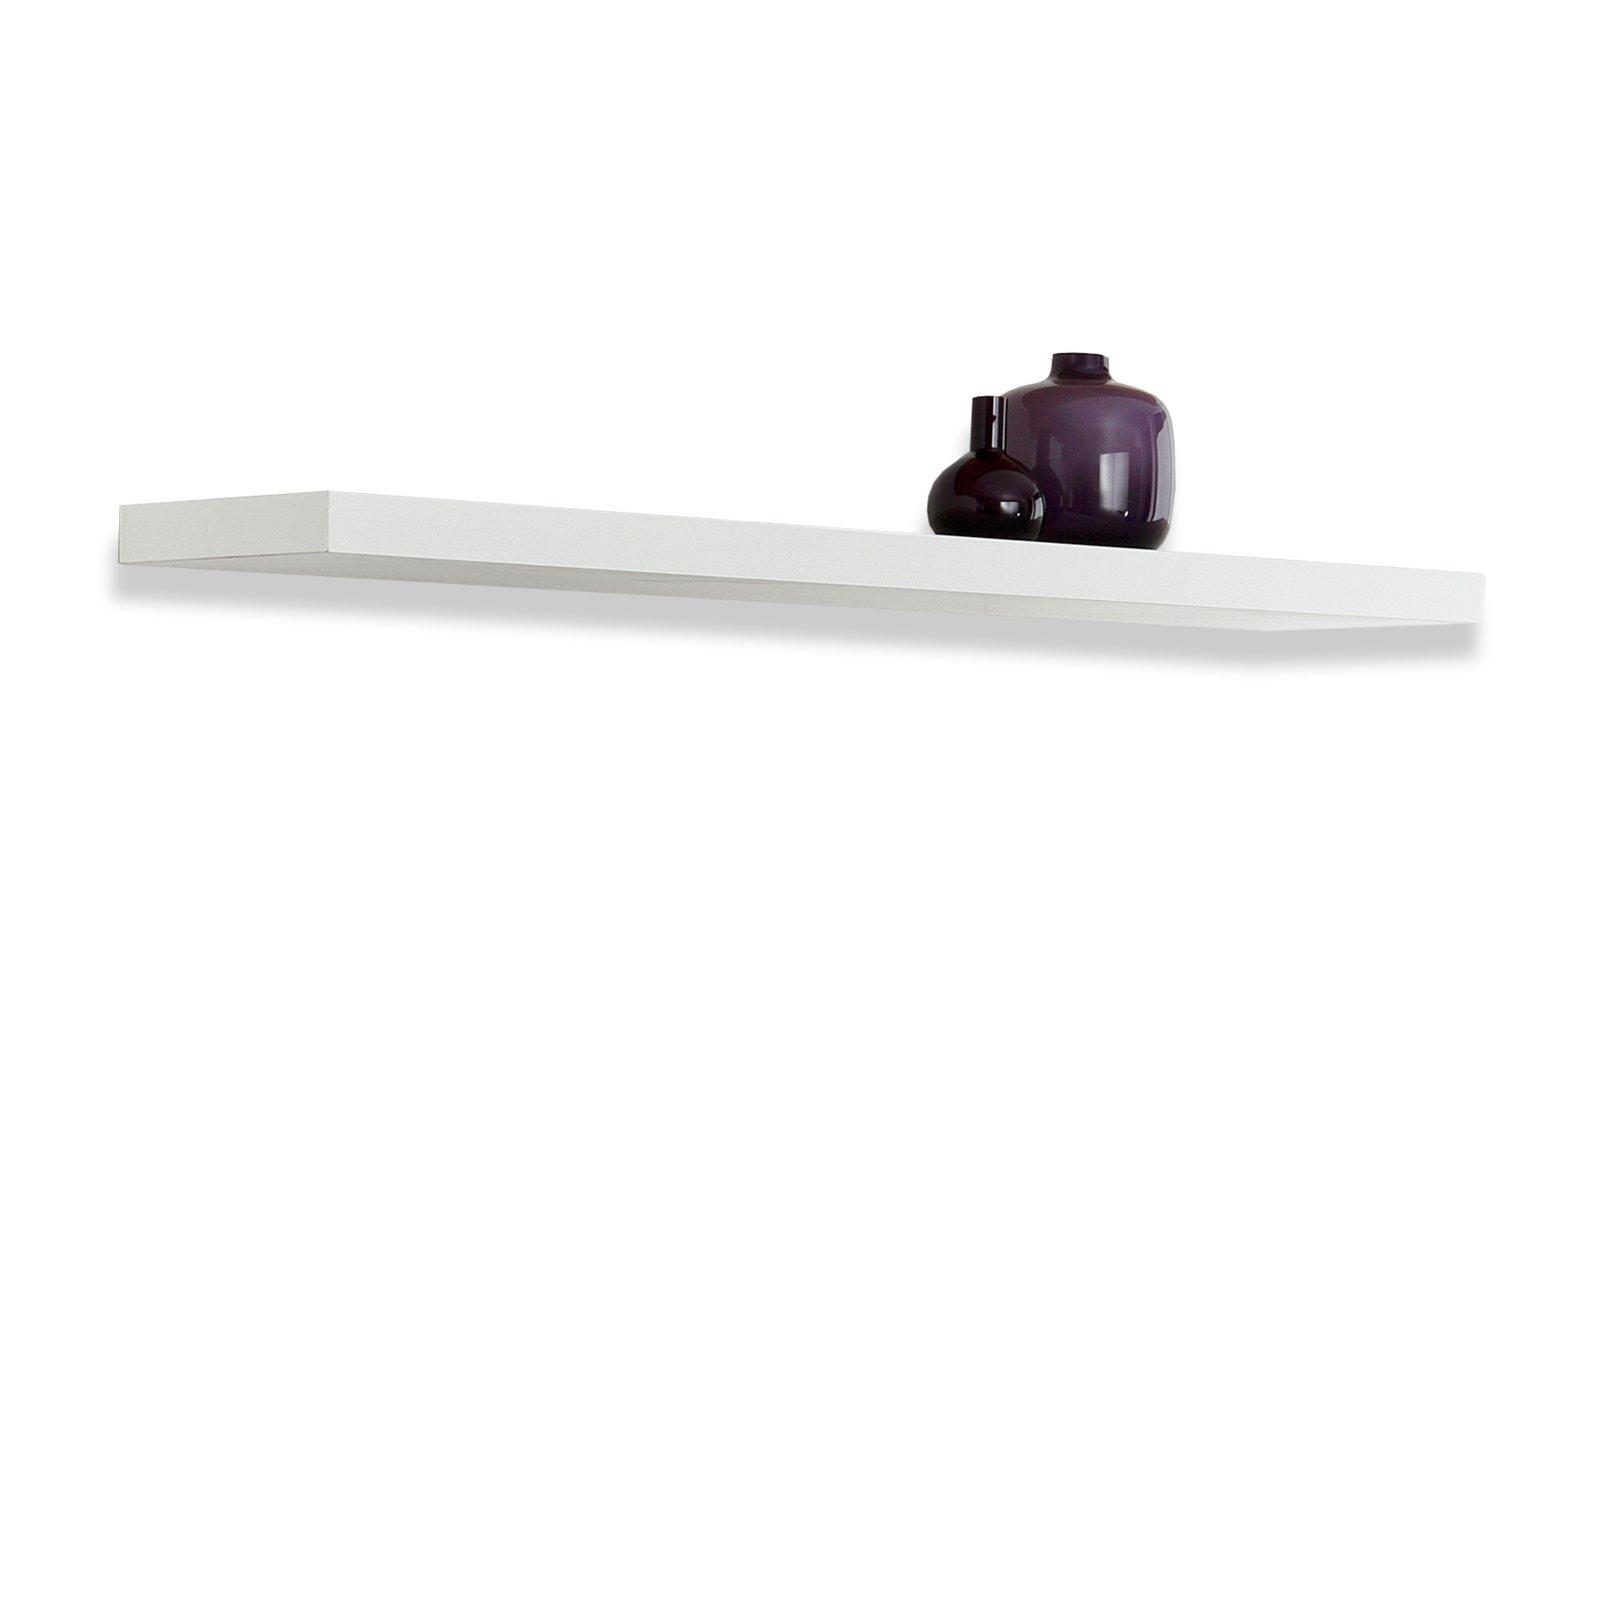 Wandregal BOARD I - weiß - 90 cm